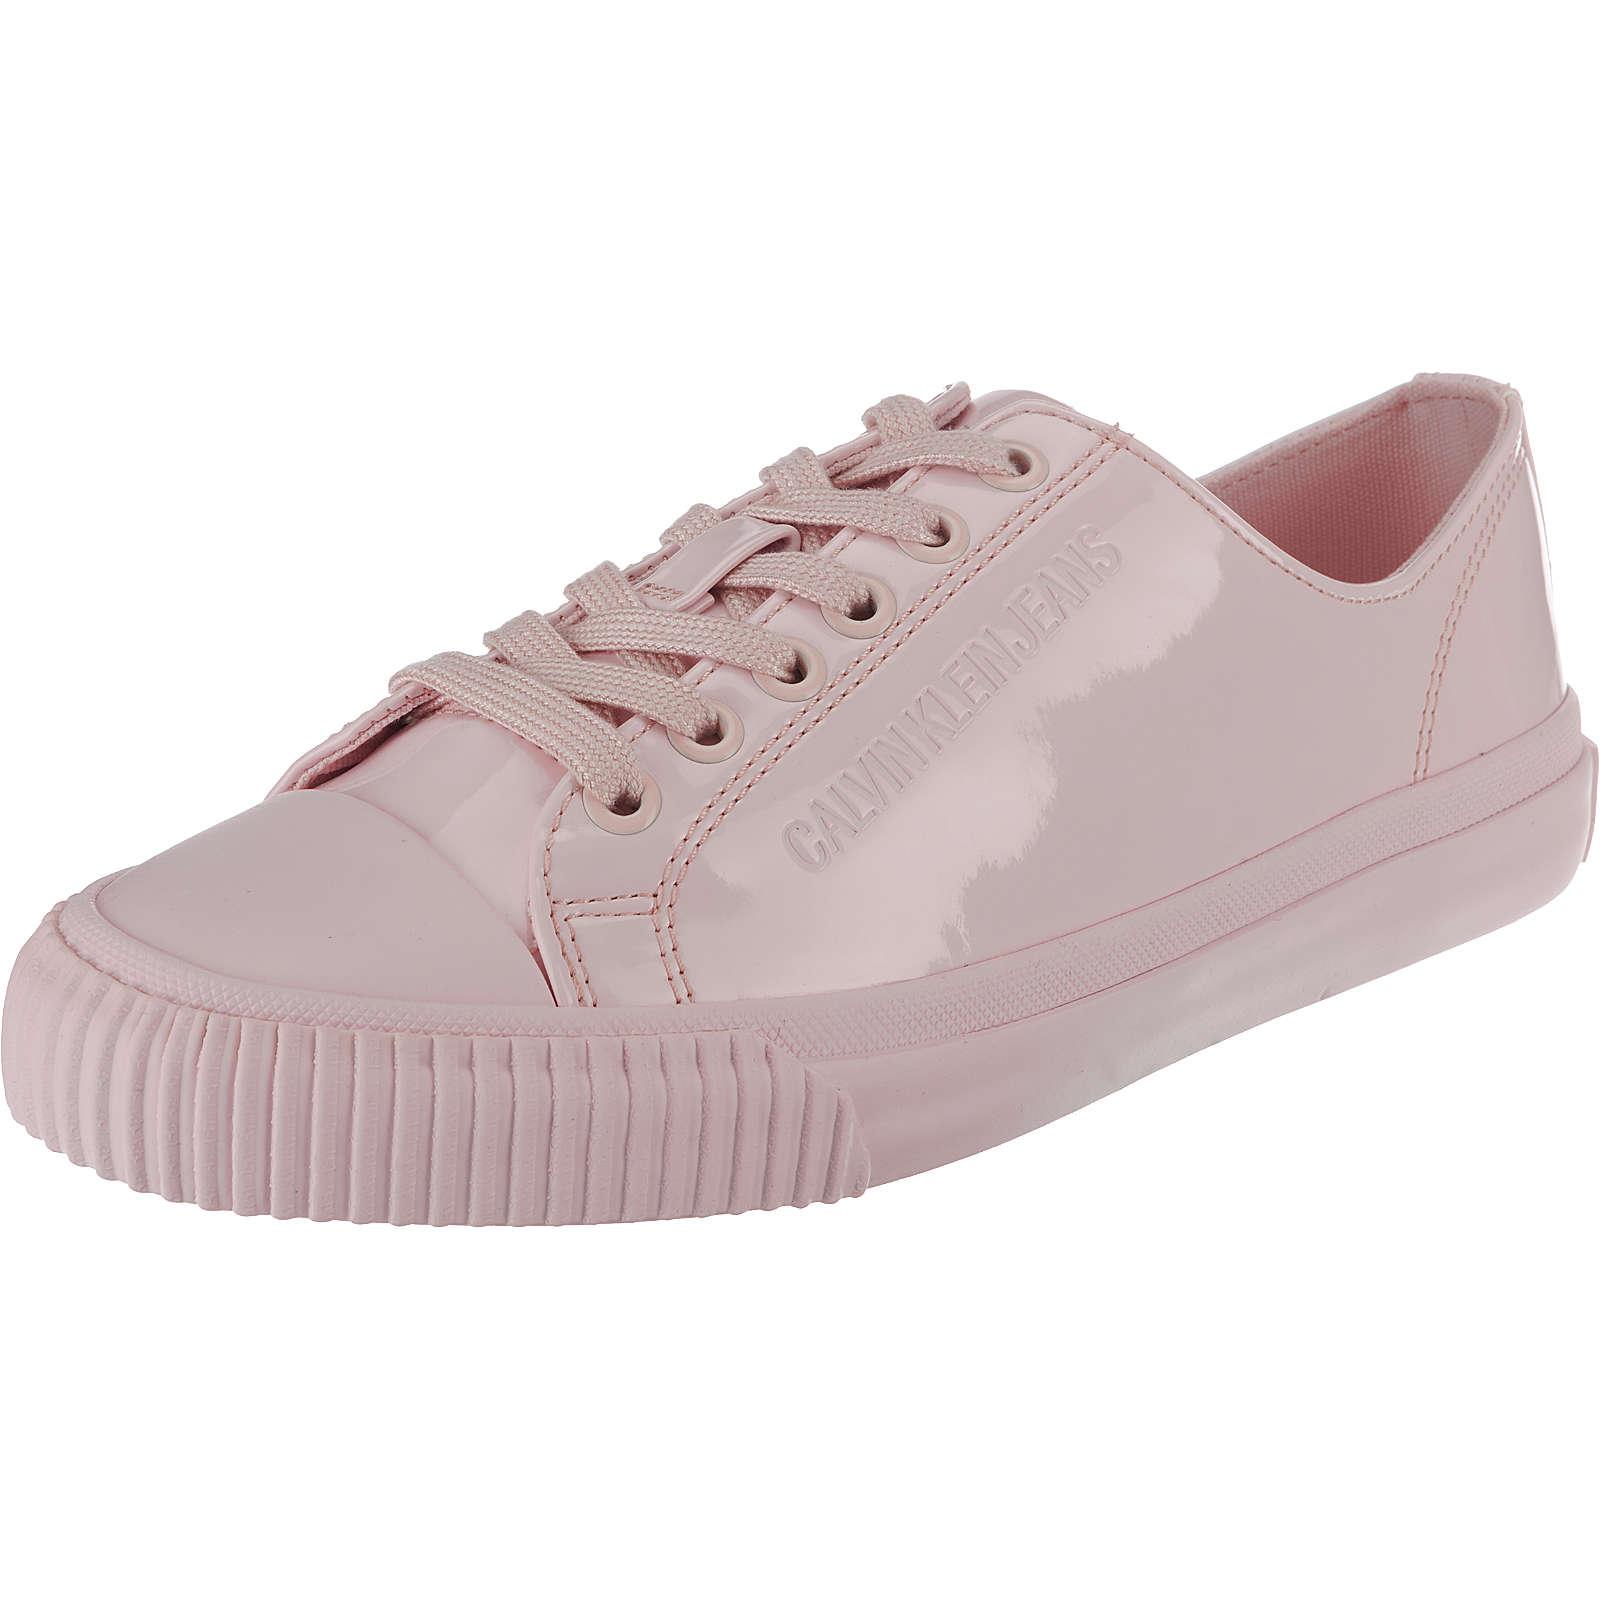 Calvin Klein Ireland Sneakers High hellrosa Damen Gr. 40